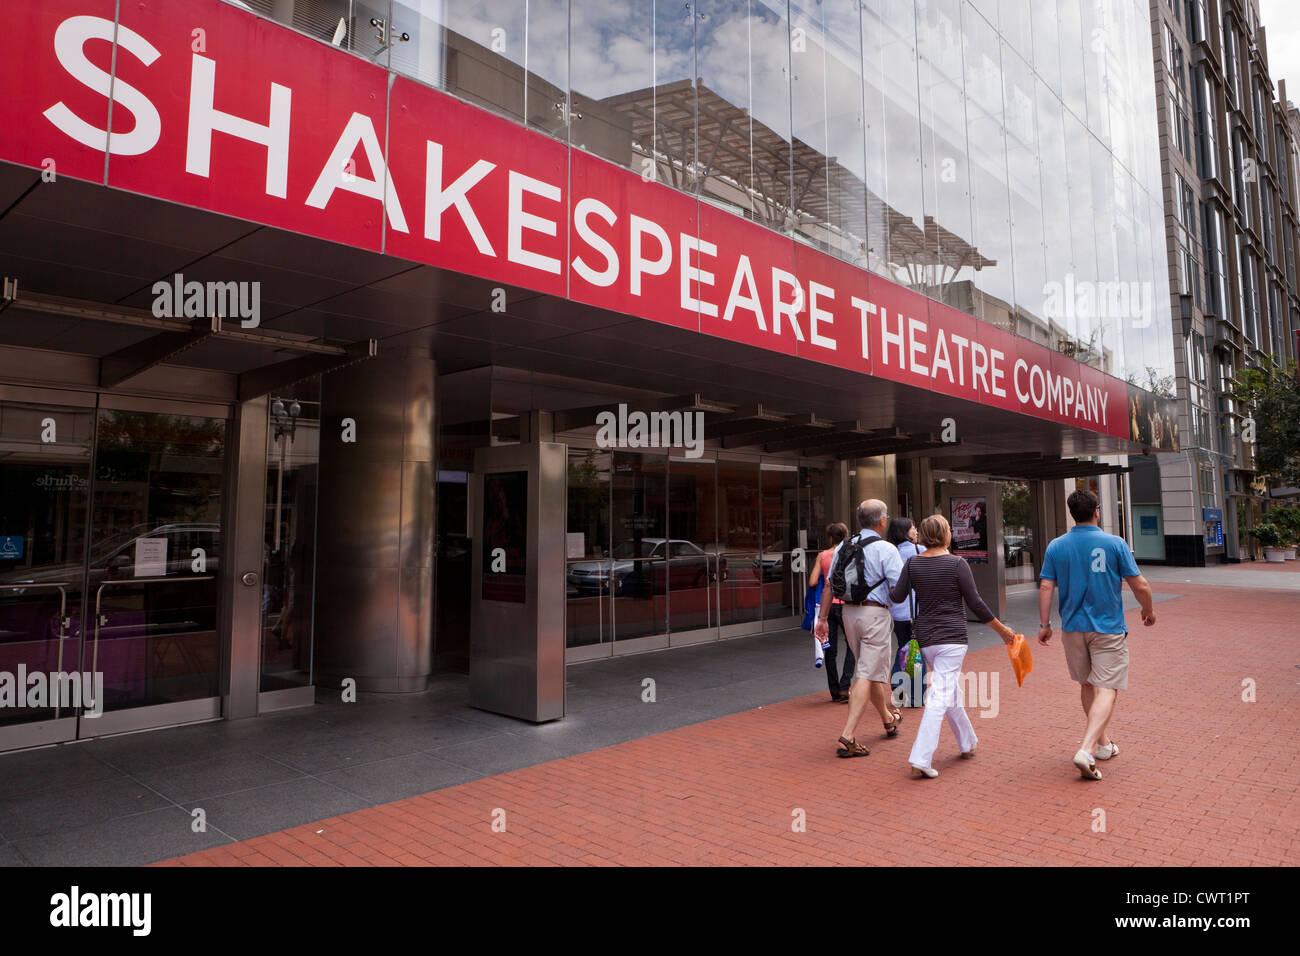 Shakespeare Theatre Company building - Washington, DC - Stock Image